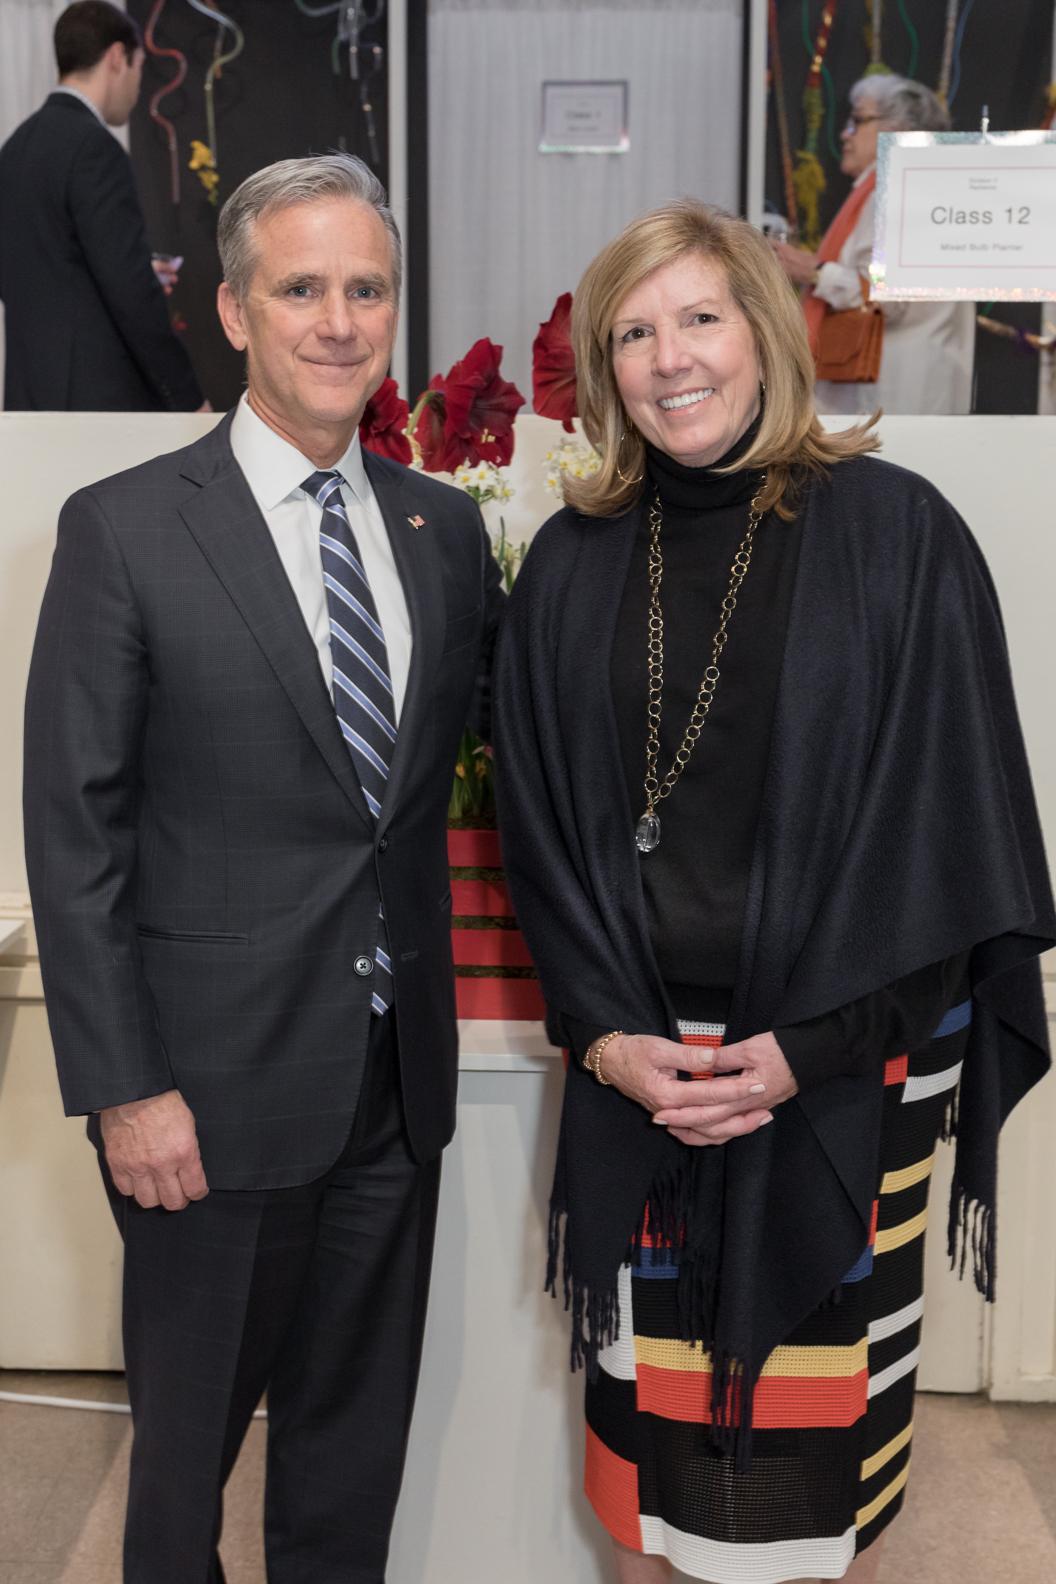 Peter and Sheri Donovan